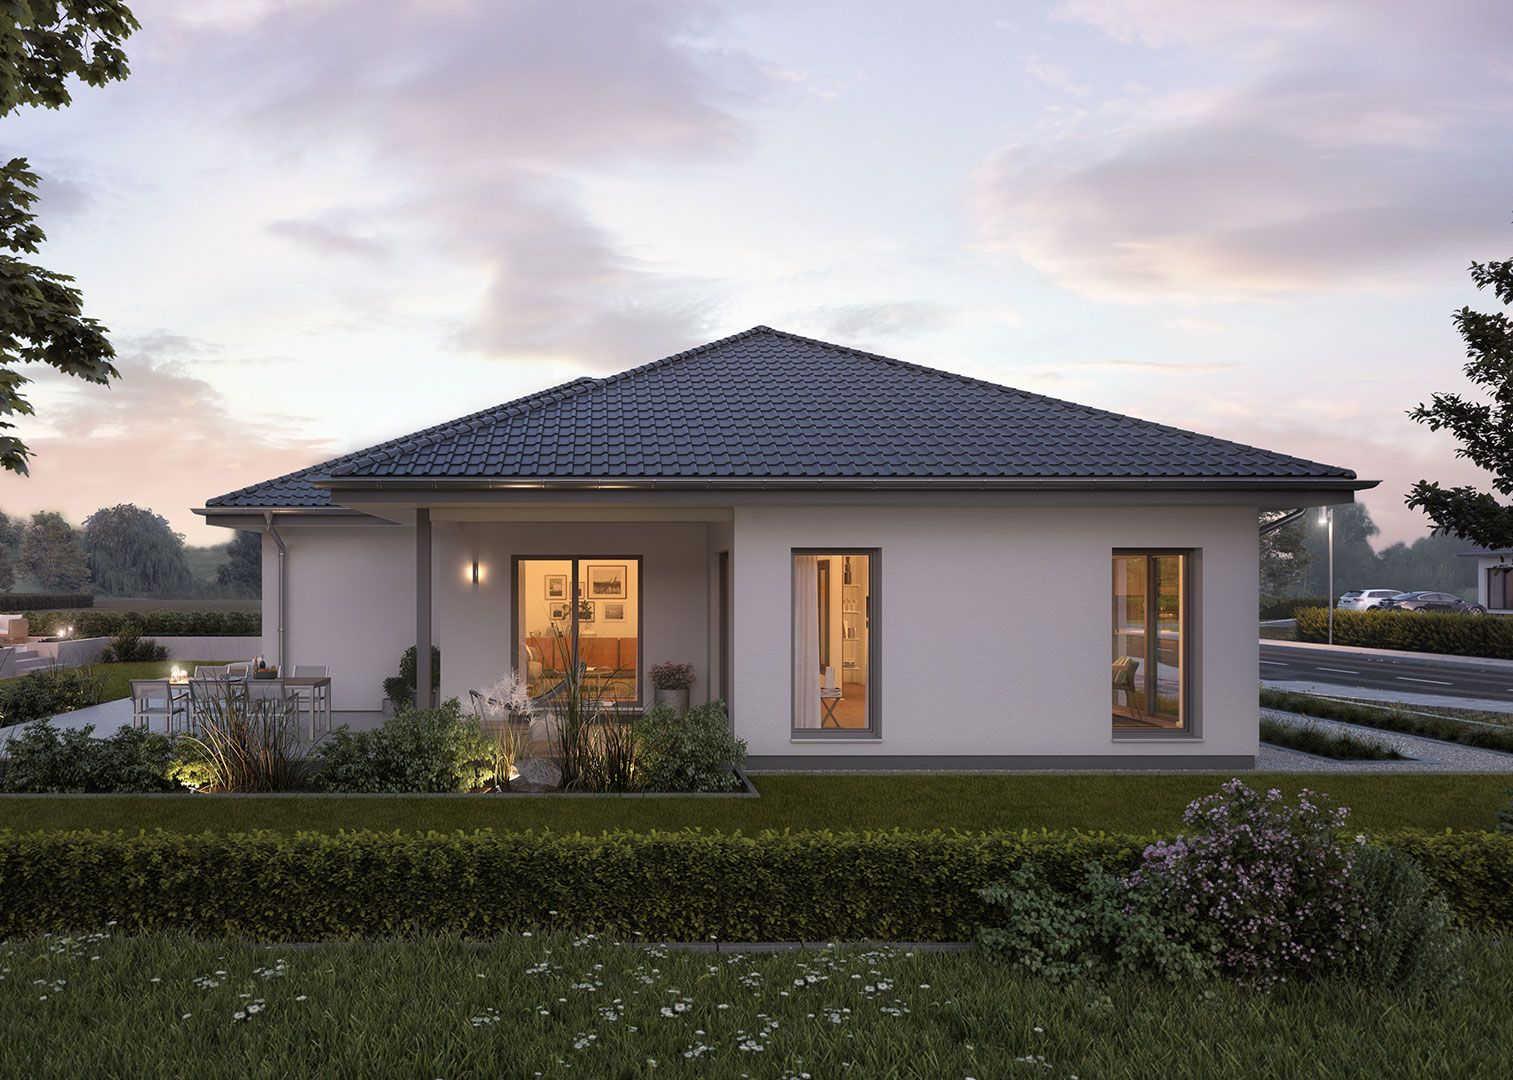 Проект дома 146